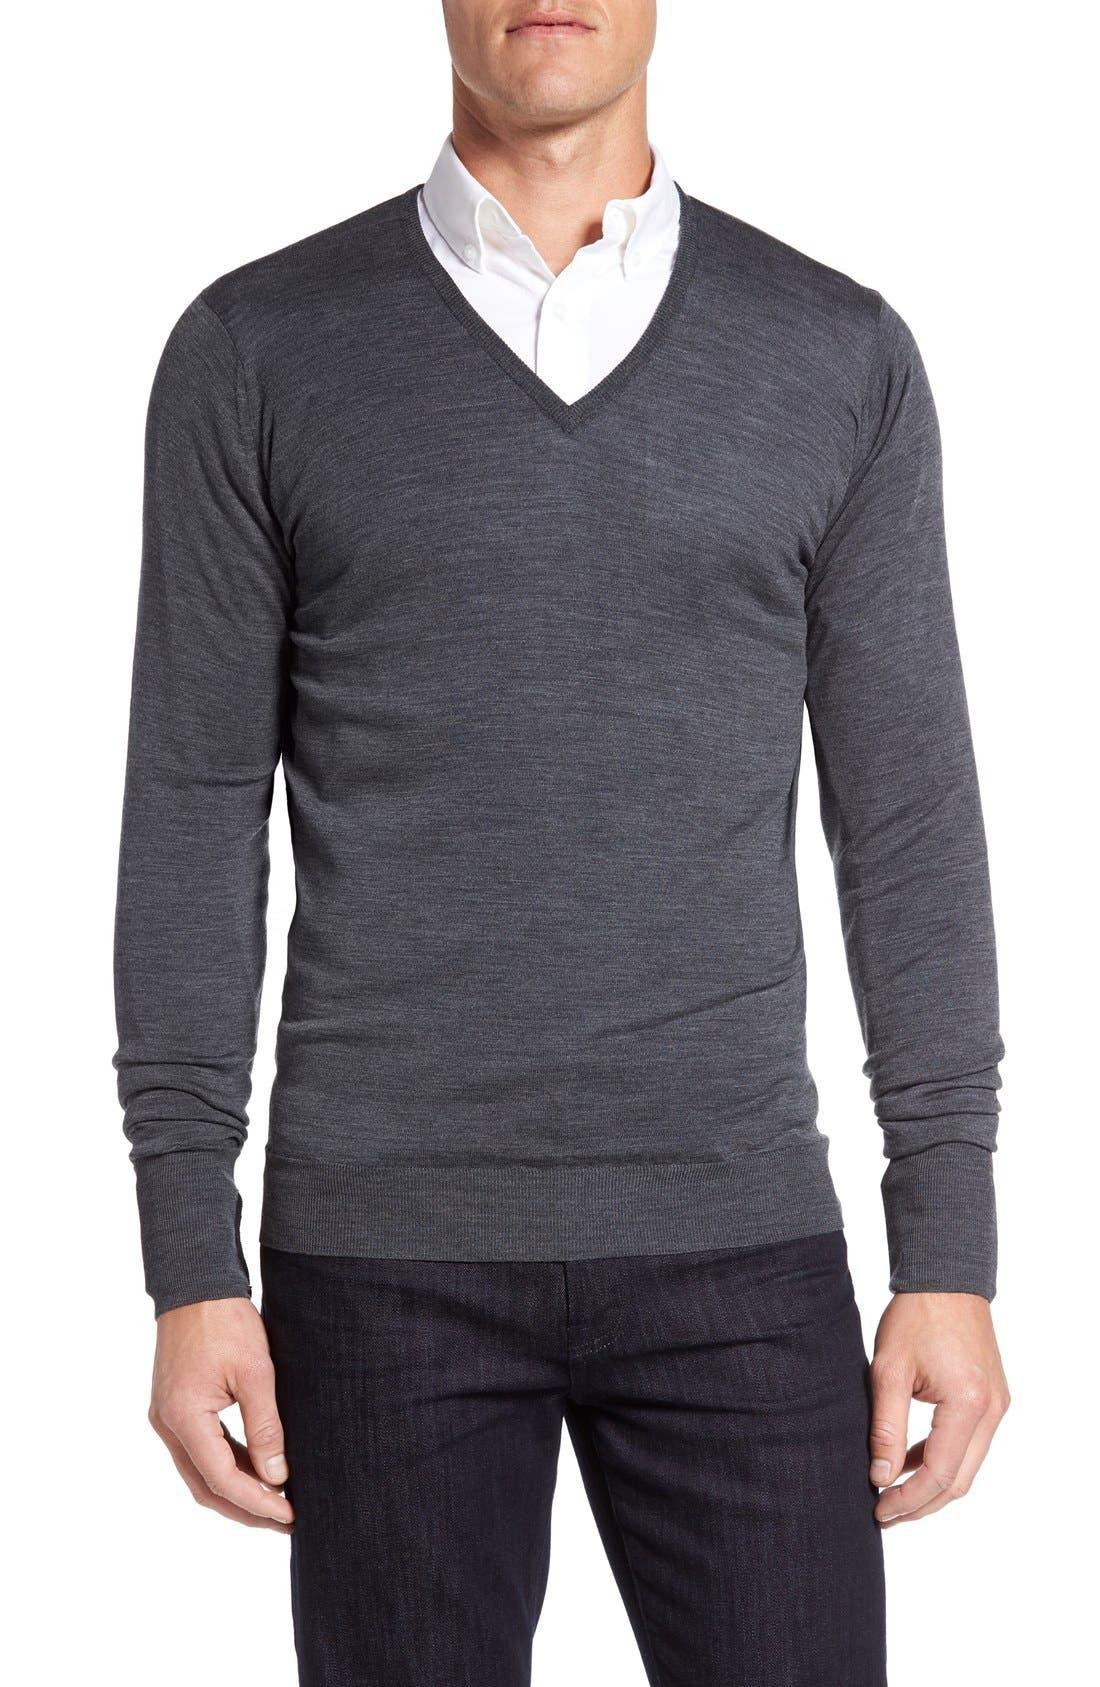 Alternate Image 1 Selected - John Smedley 'Bobby' Easy Fit V Neck Wool Sweater